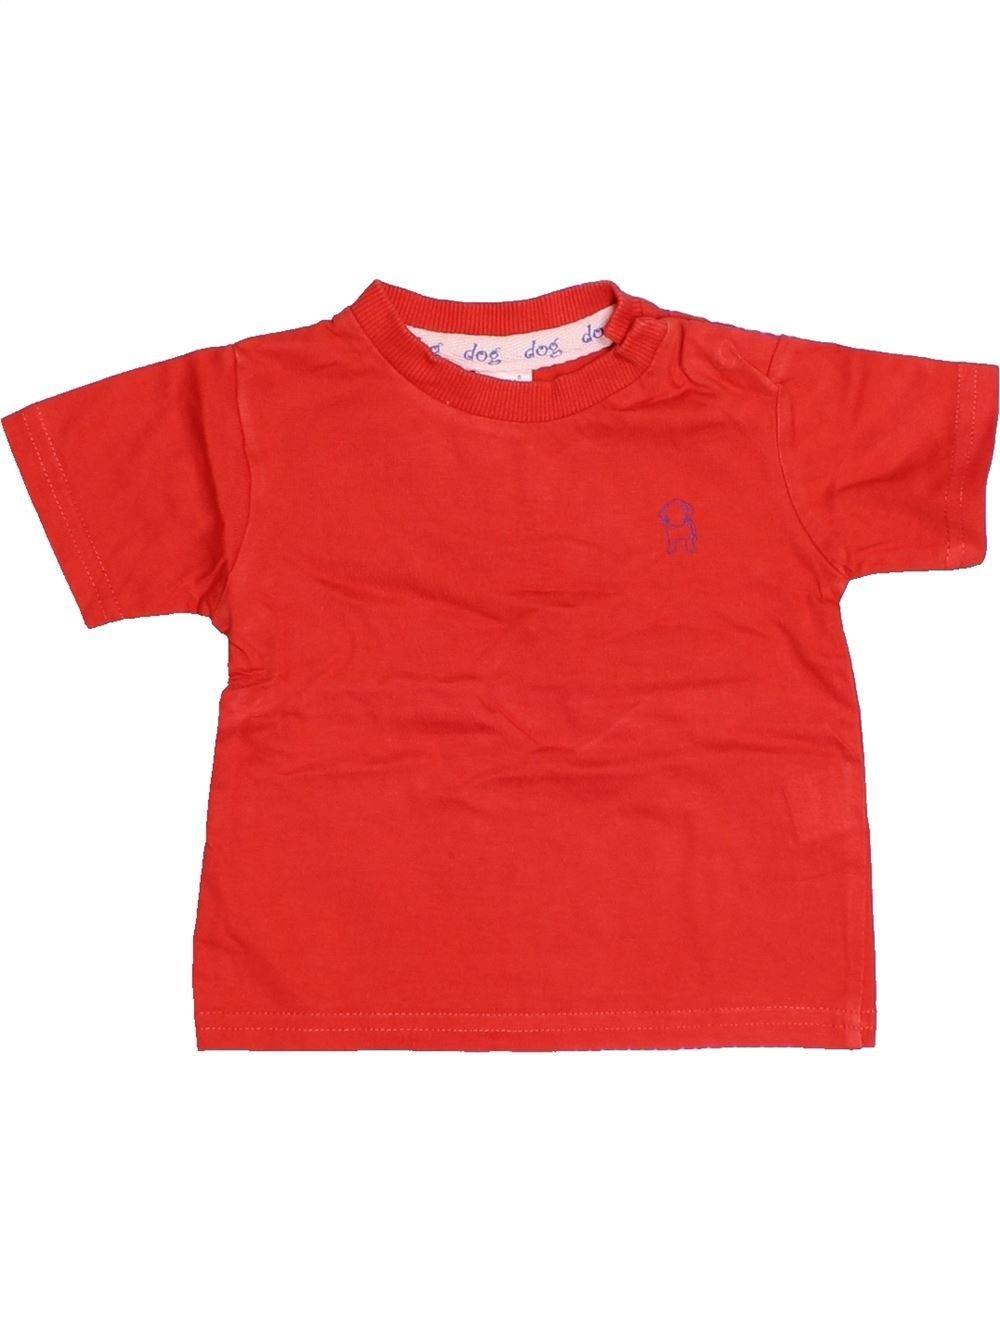 Rouge Shirt Femme T Zara Yf76ygvb